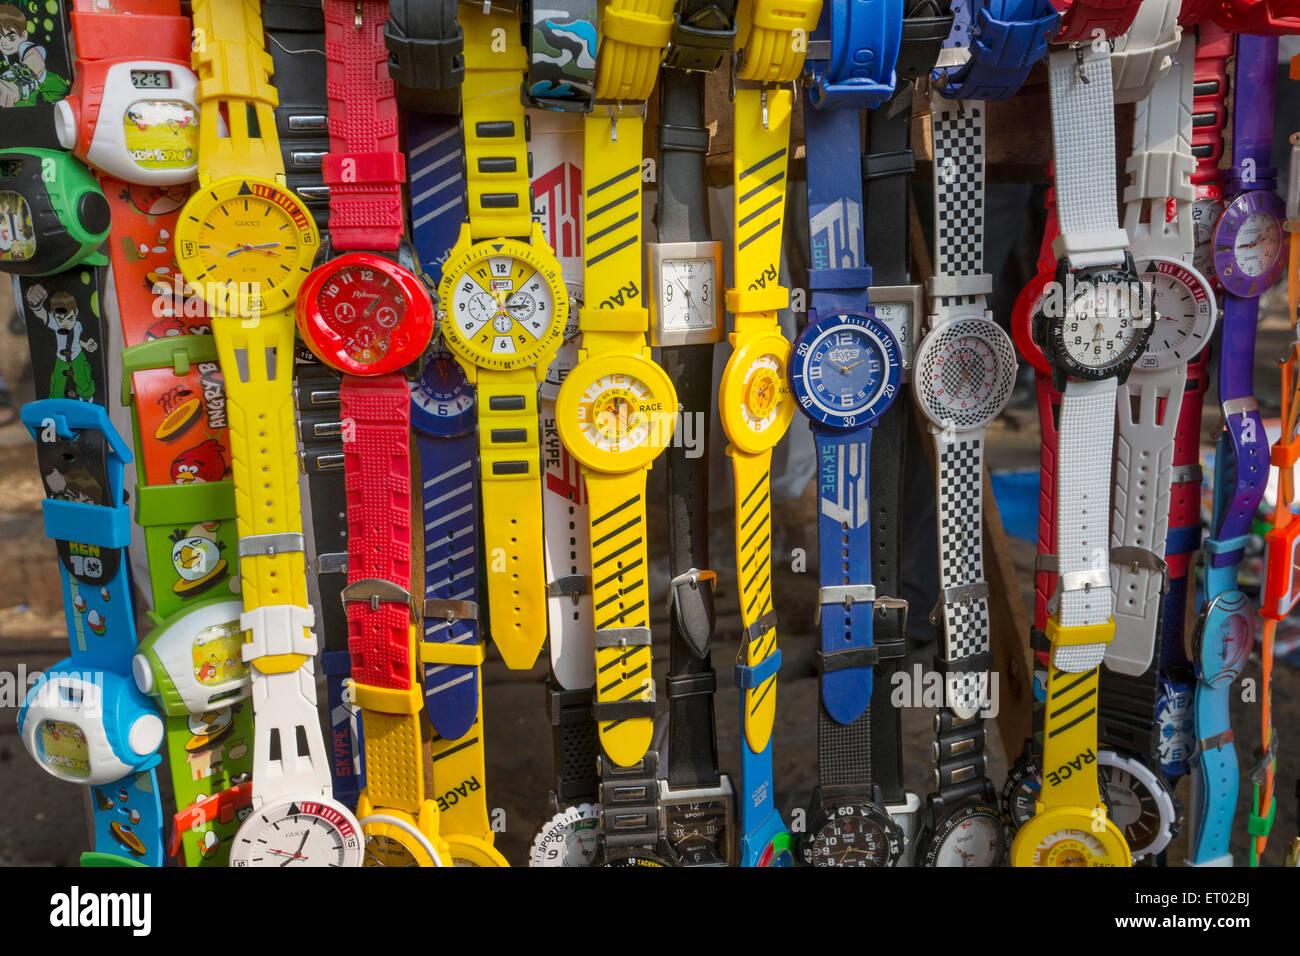 PVC Wrist watch India Asia - Stock Image